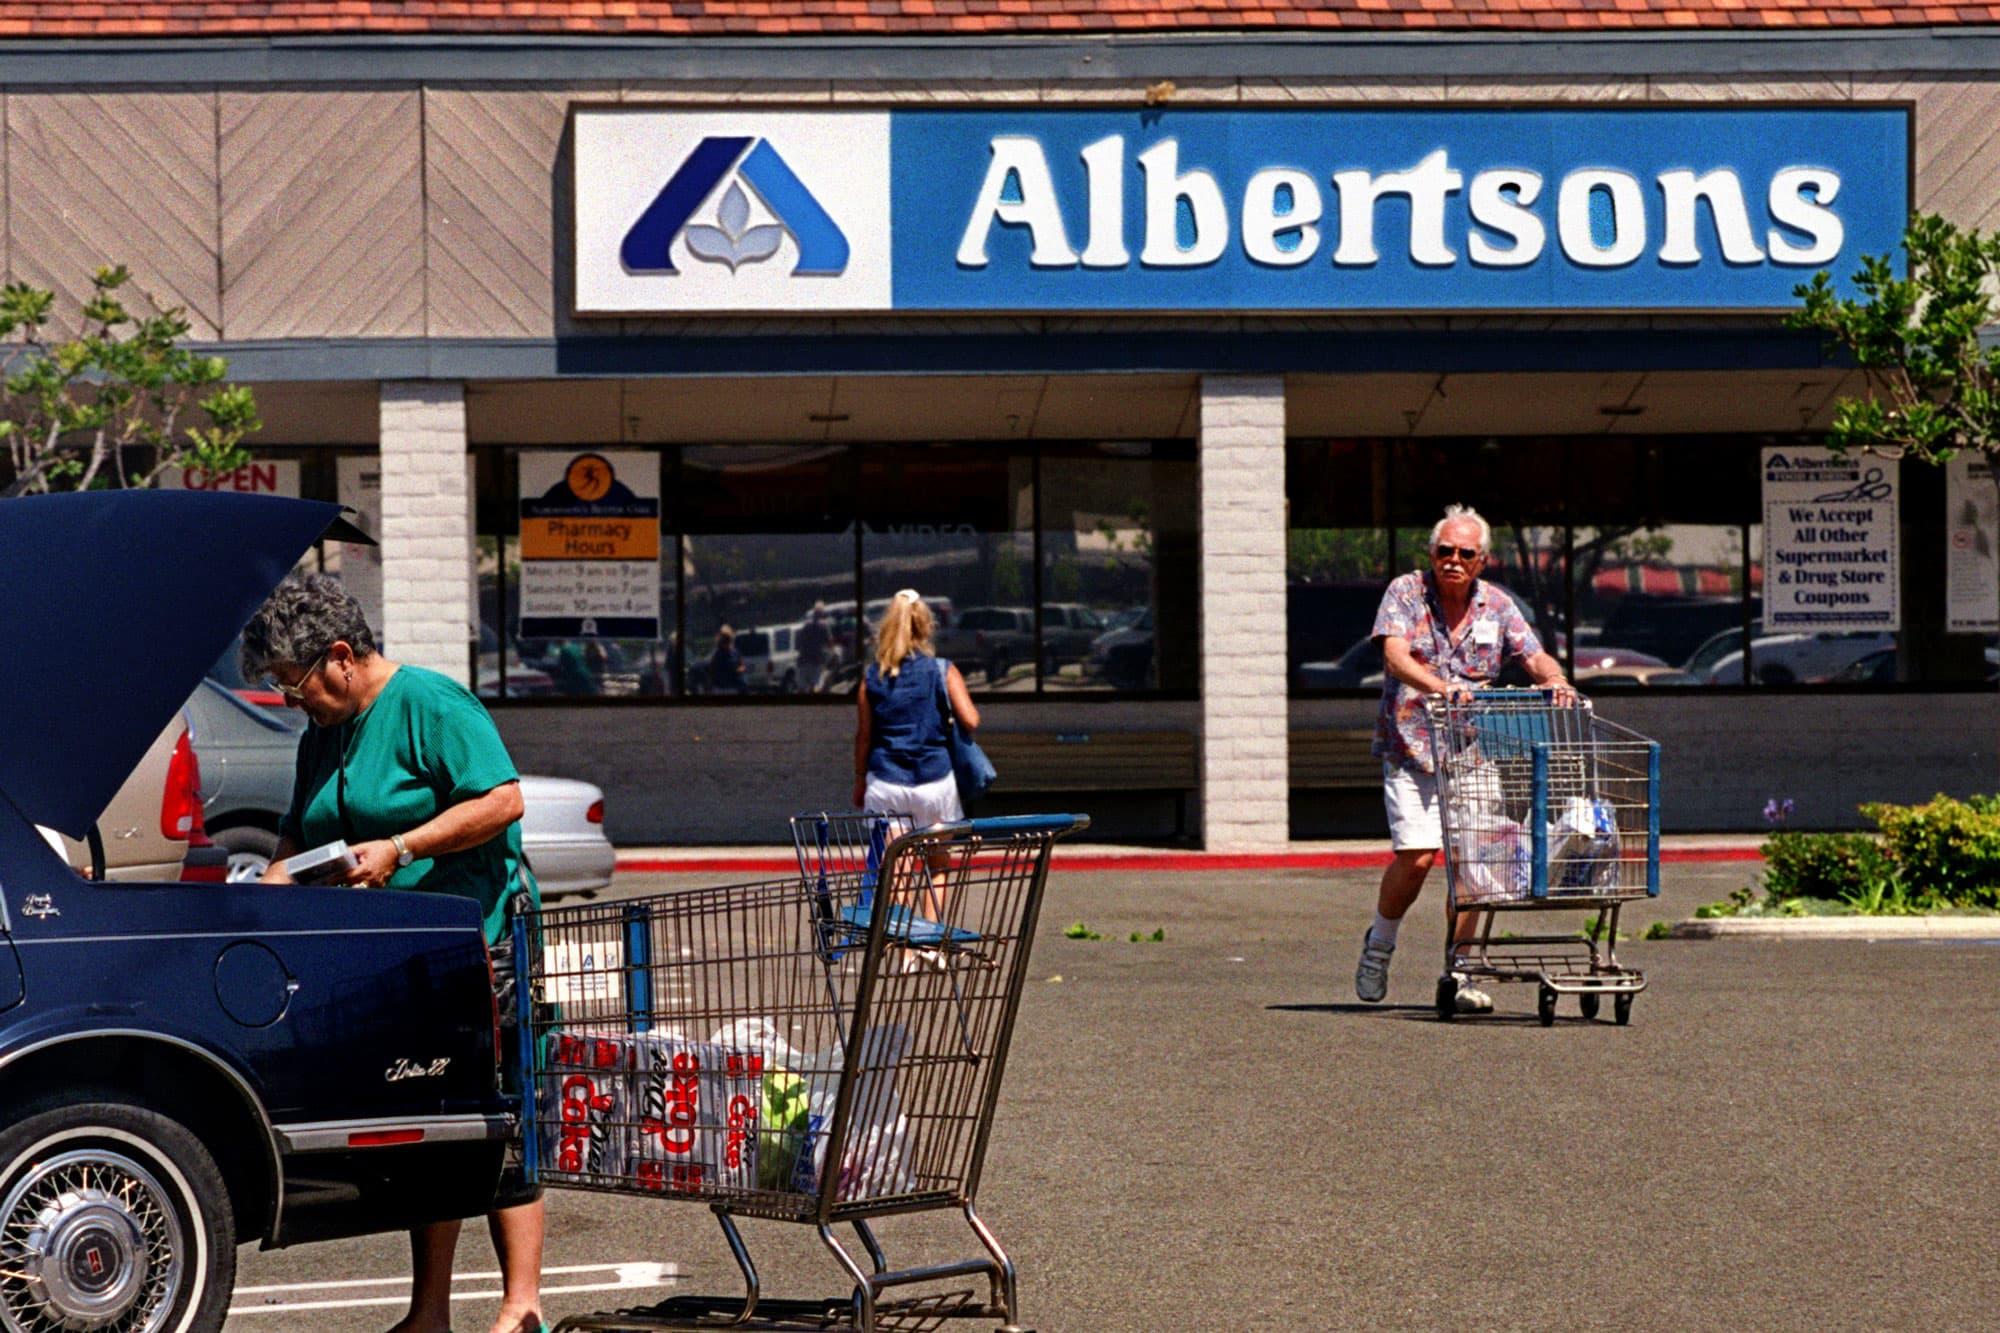 Albertsons History